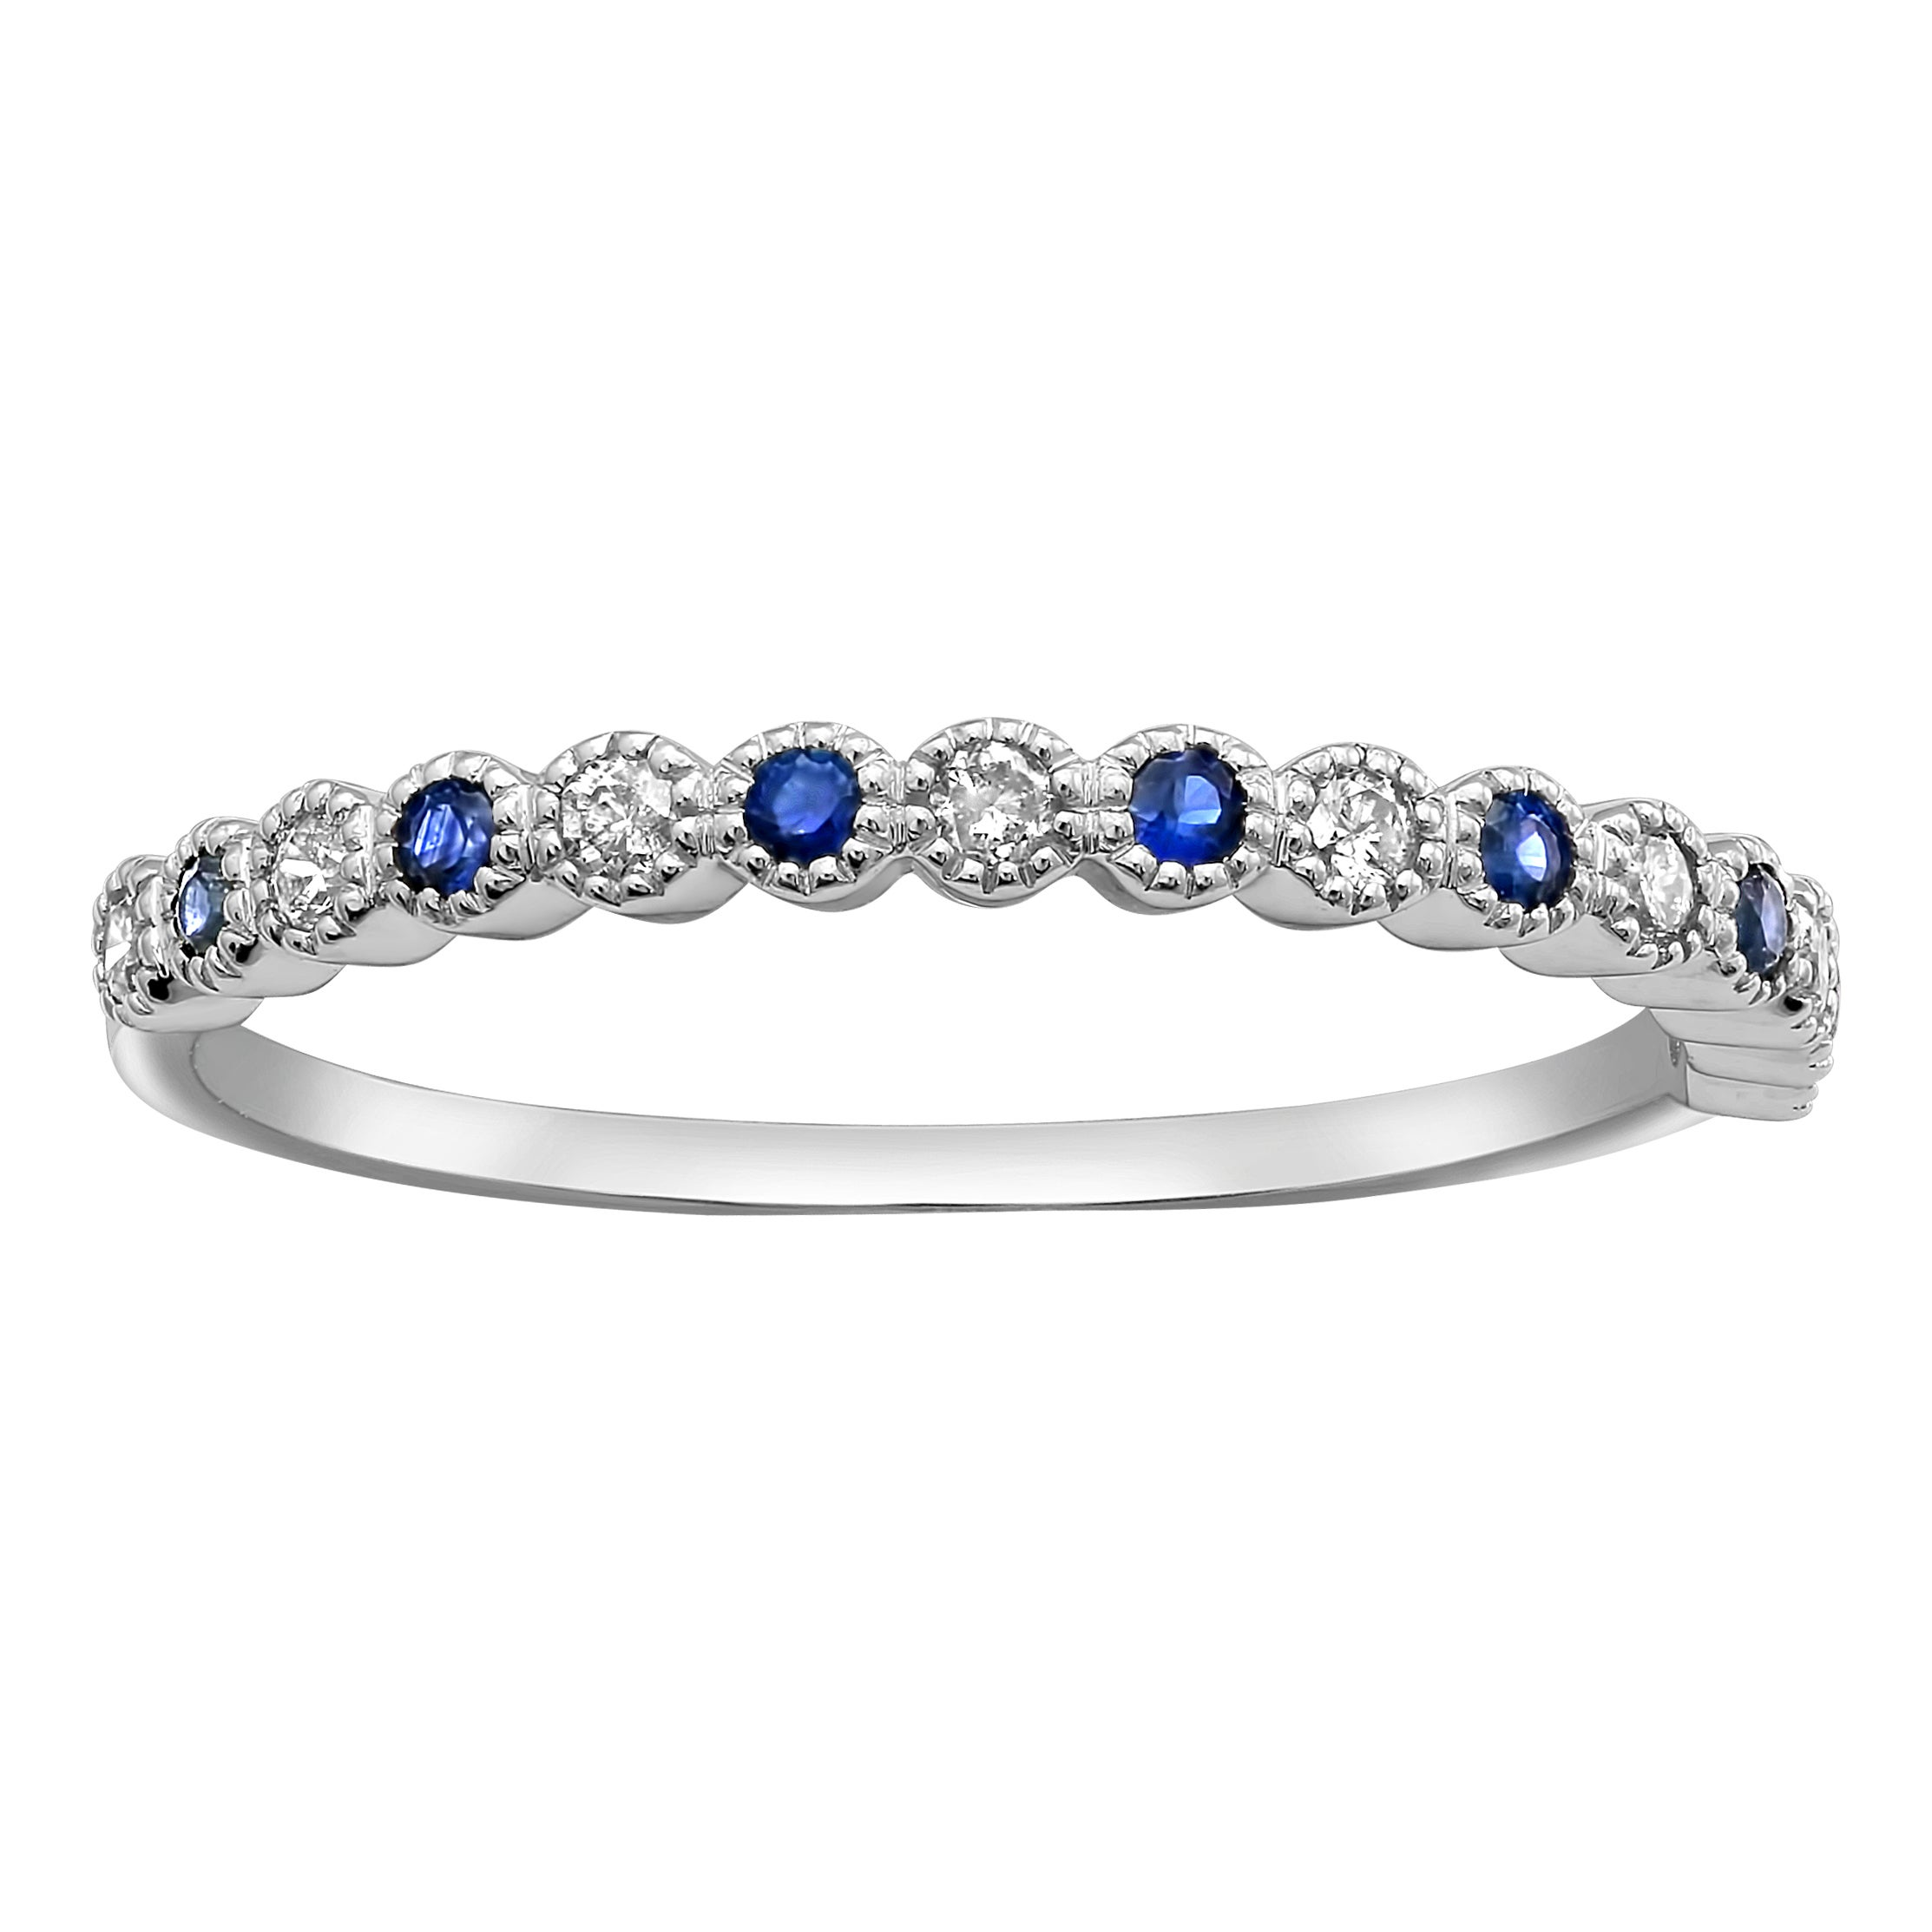 Size-7.5 Diamond Wedding Band in 14K White Gold G-H,I2-I3 1//10 cttw,